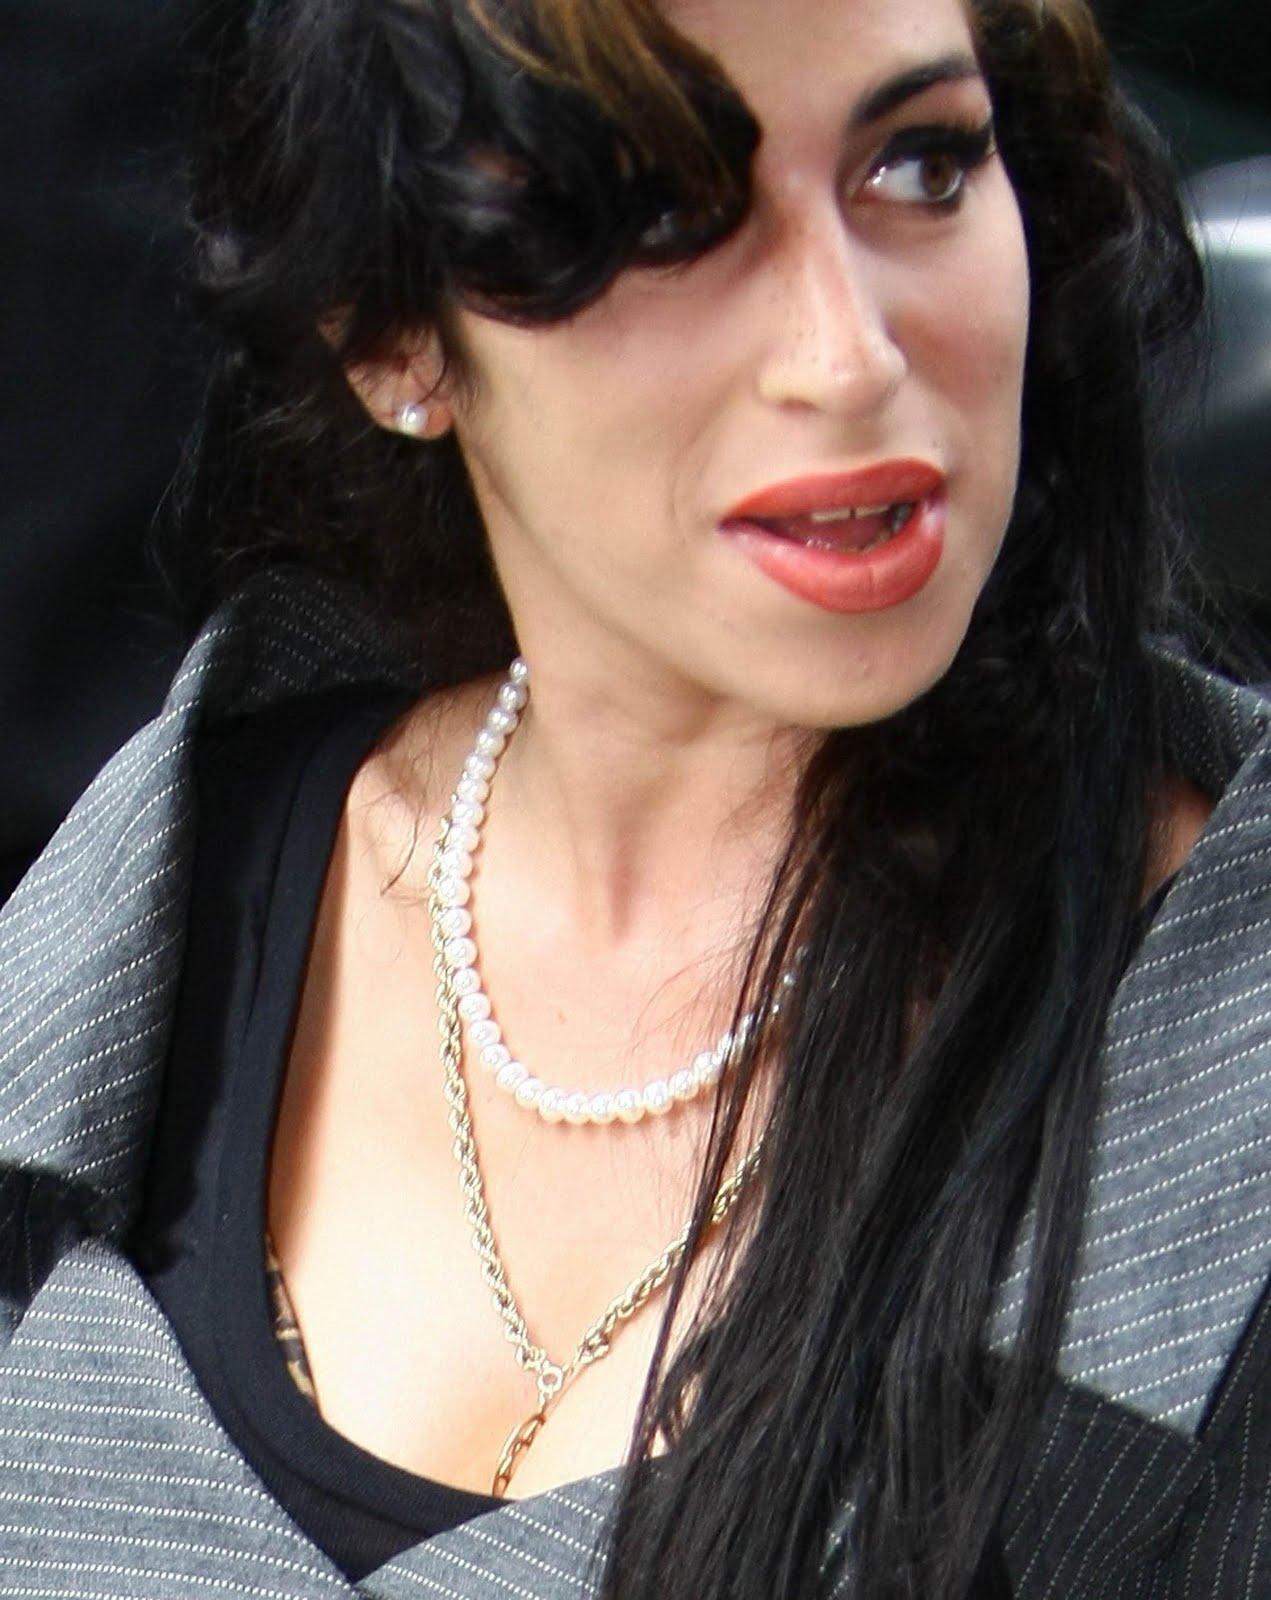 https://3.bp.blogspot.com/-DFBiteyPw08/Tiv3T_kwVFI/AAAAAAAAKOI/Hy-sinWqHr0/s1600/Amy+Winehouse+Pictures.jpg